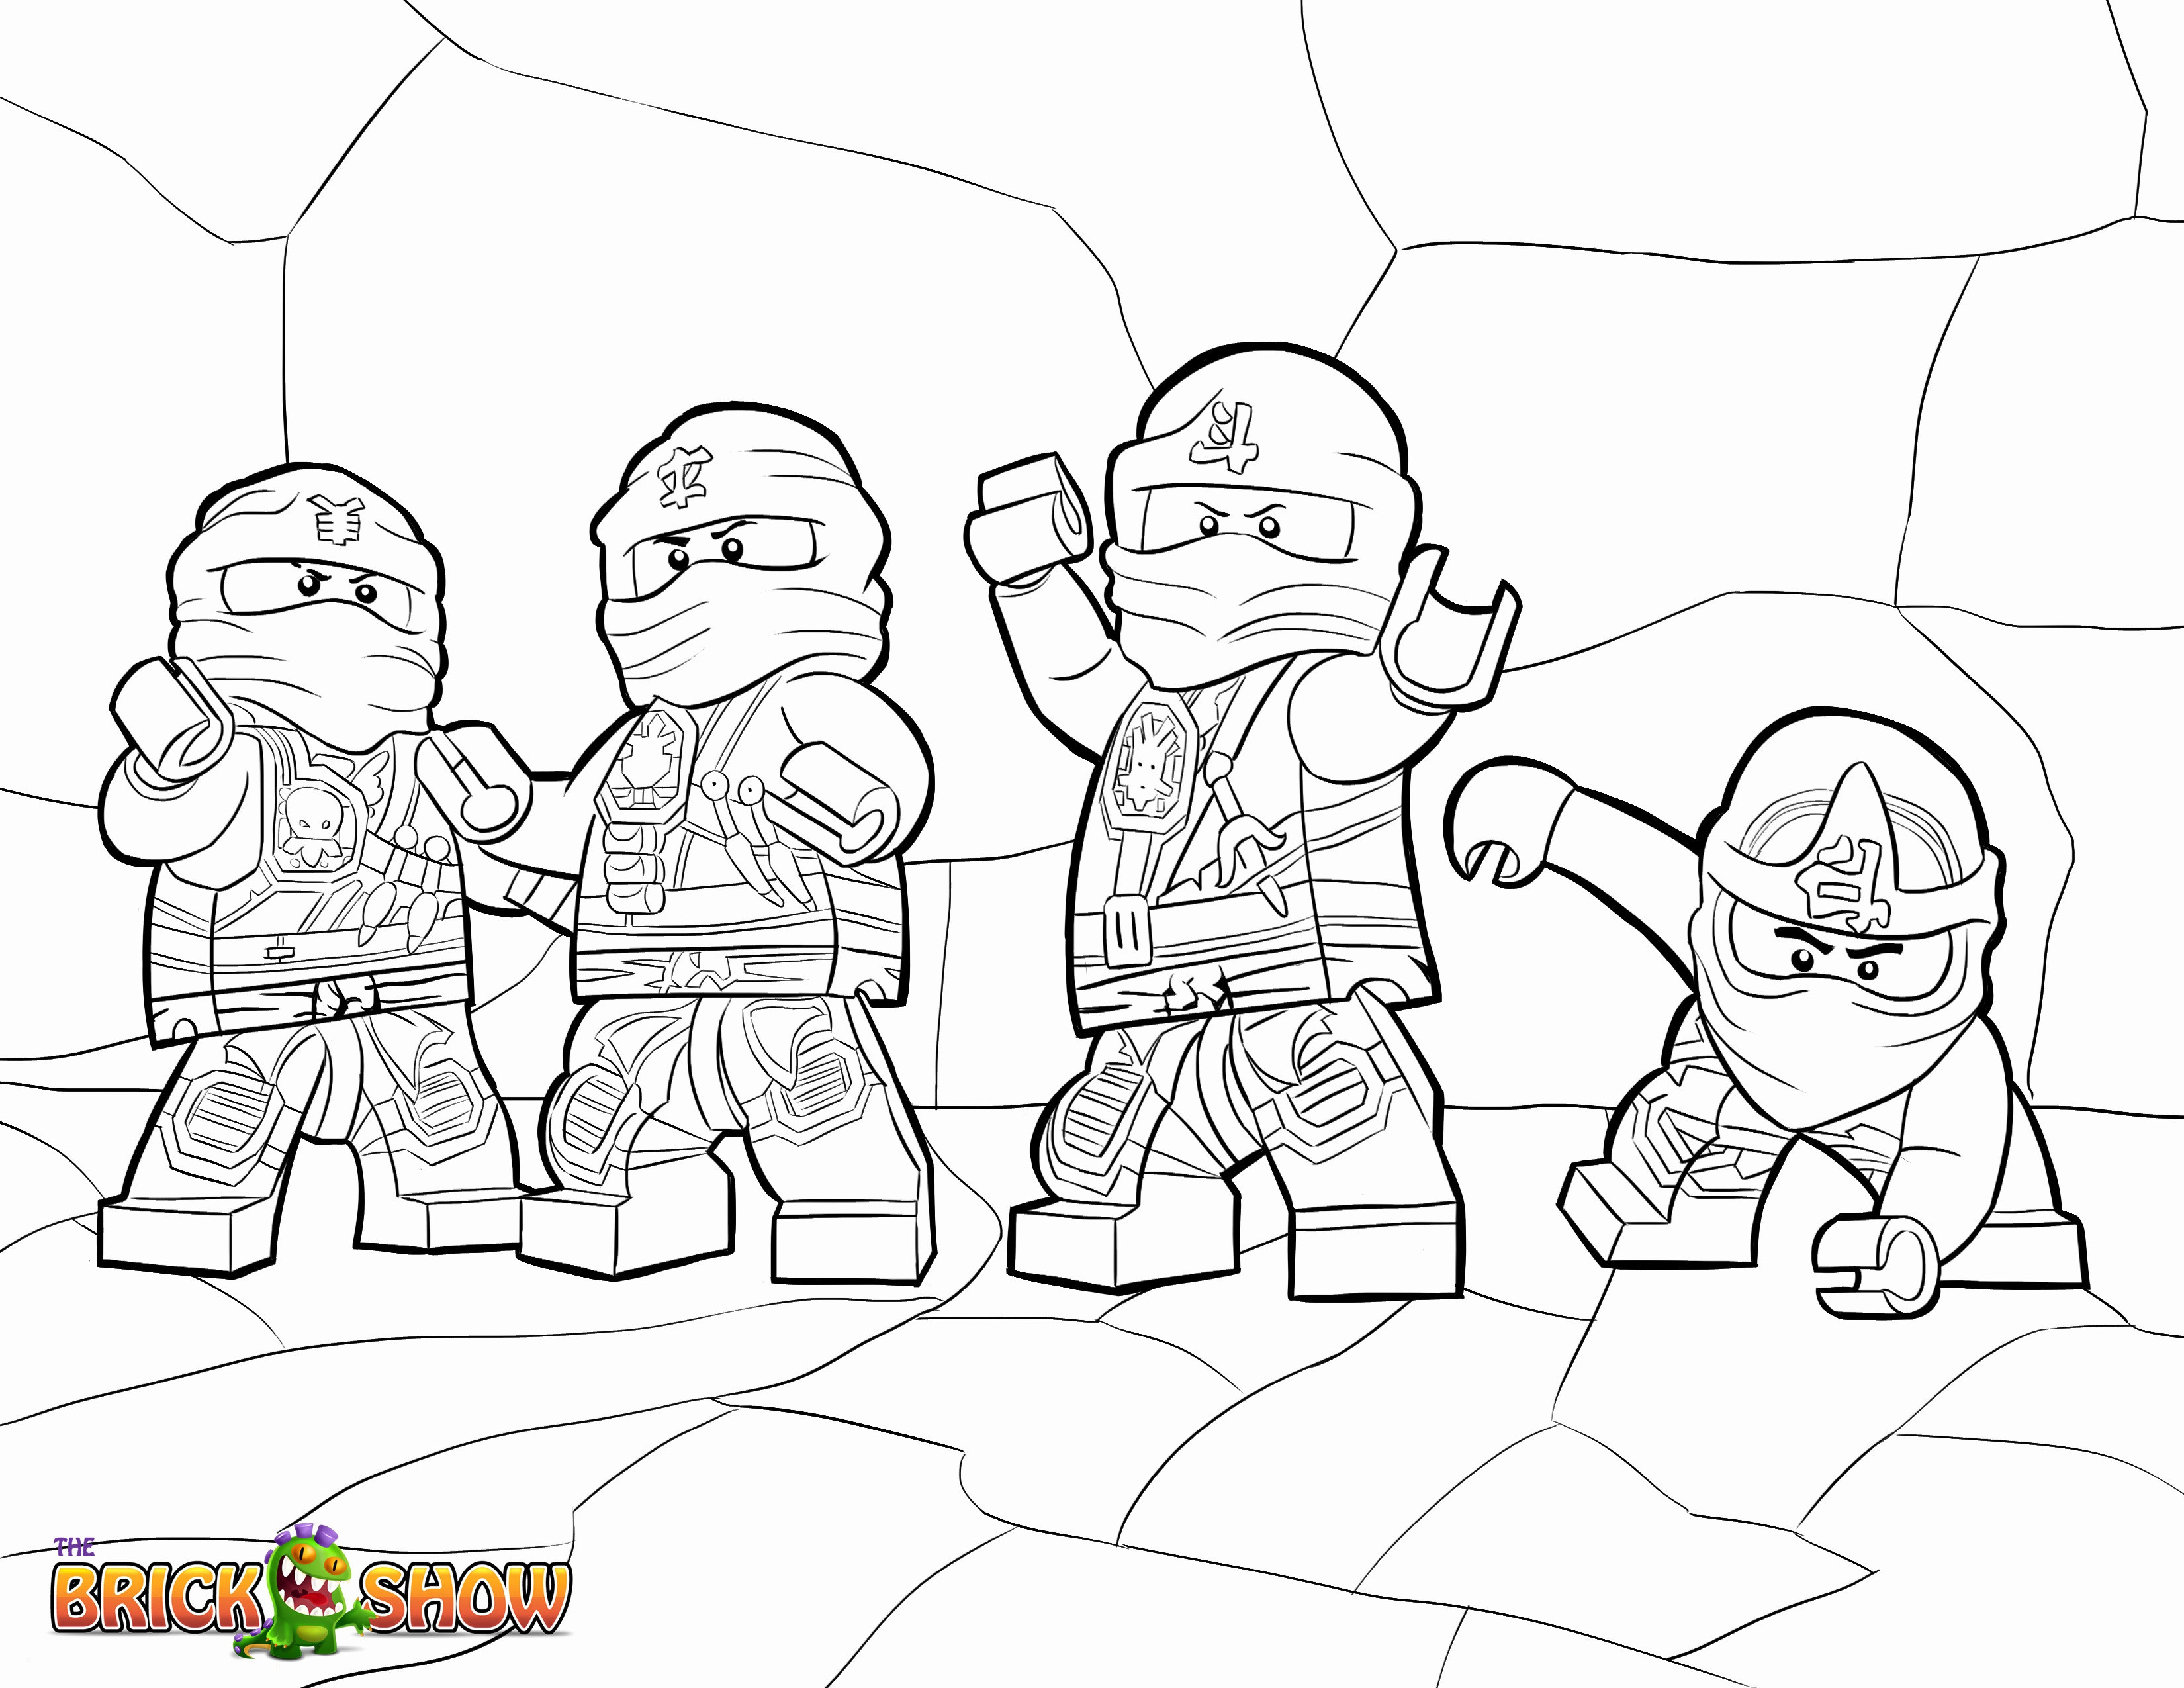 Ninjago Ausmalbilder Jay Genial Lego Chima Coloring Pages Lovely Lego Ninjago Coloring Pages Nice 41 Sammlung